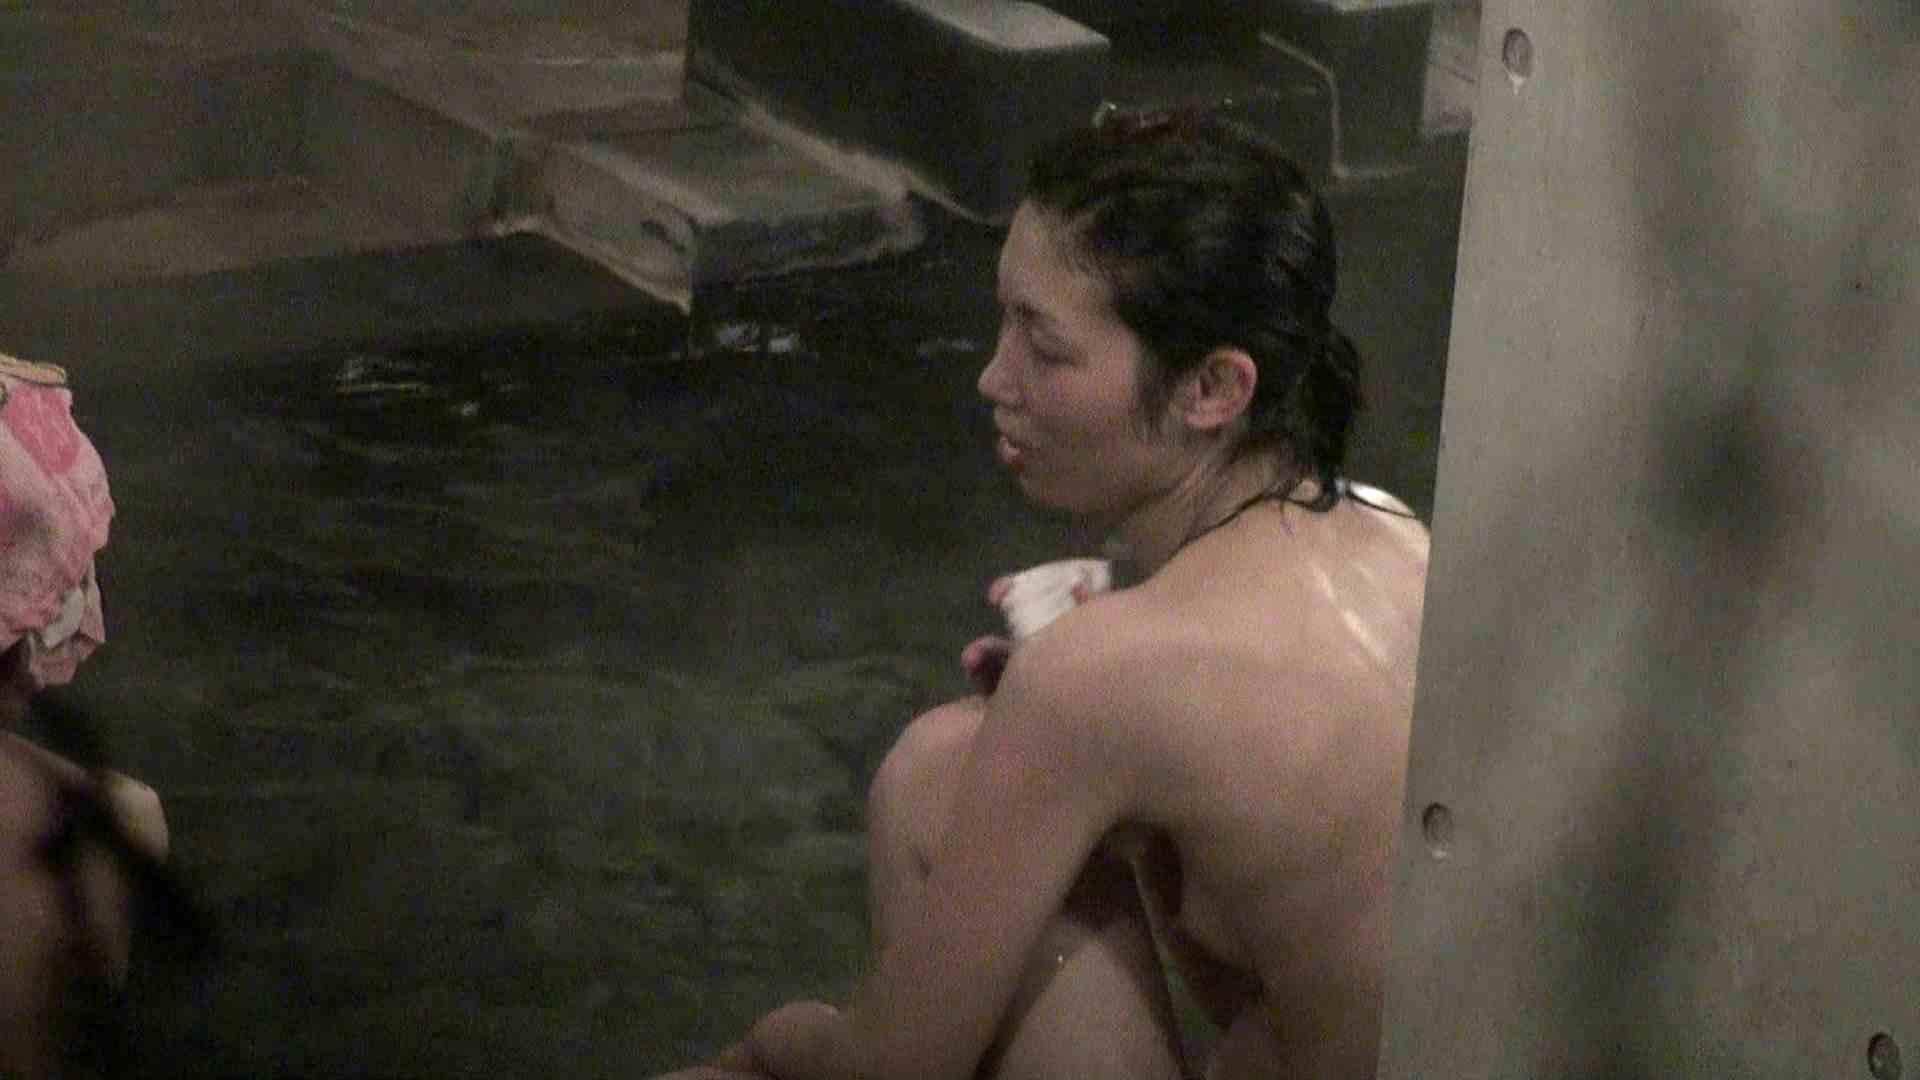 Aquaな露天風呂Vol.399 0   0  81連発 67